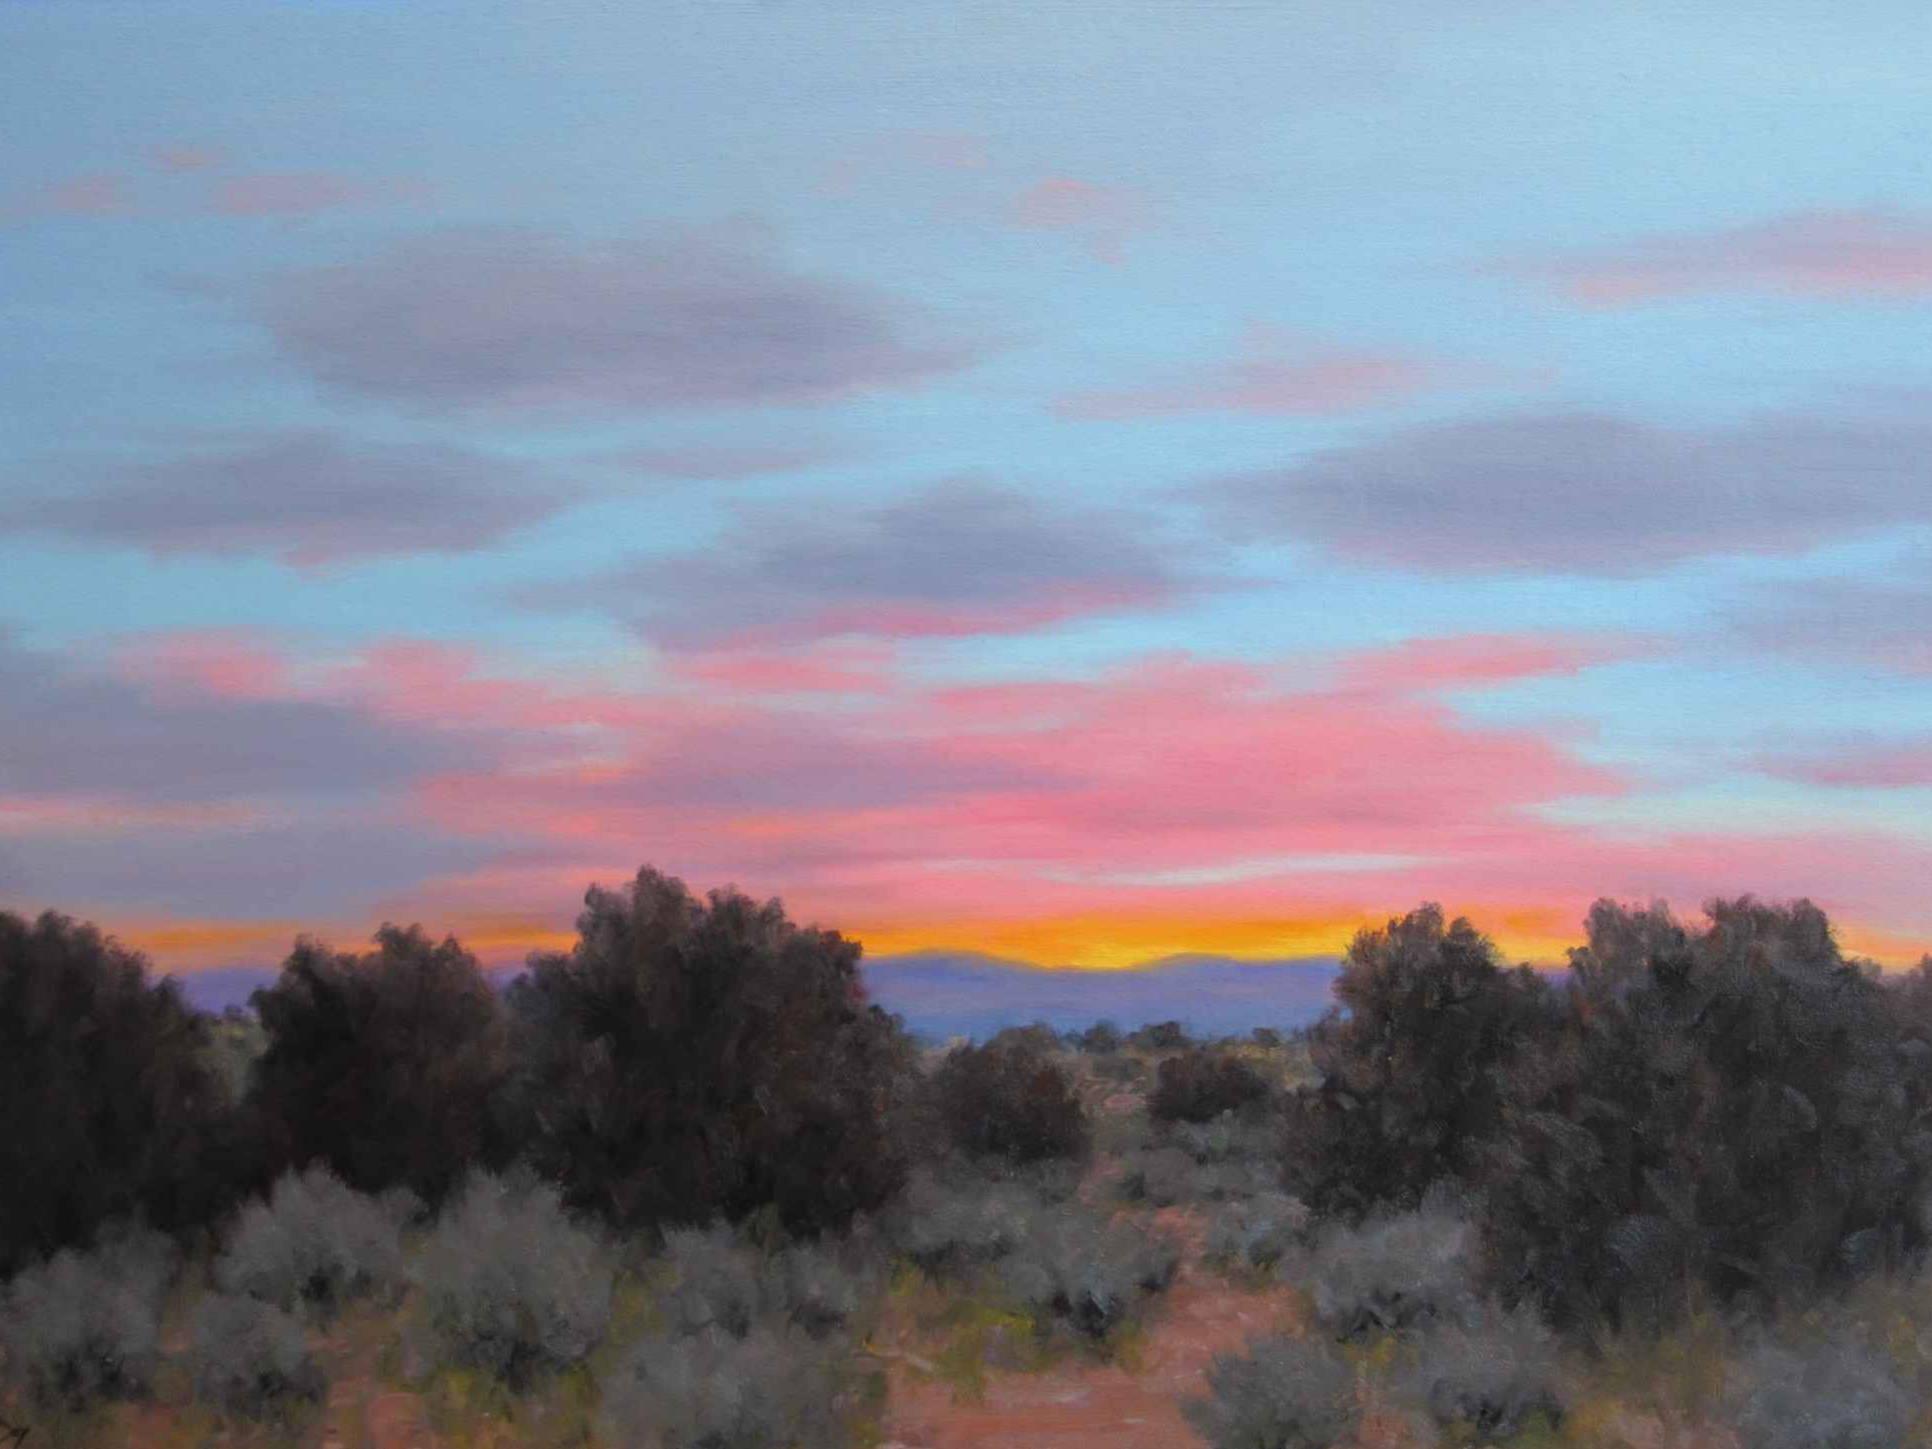 Stephen Day. Stephen Day Artist. Landscape Painter. Sorrel Sky Gallery. Santa Fe Art Gallery. Maura Allen. Edward Aldrich. Kevin Red Star. Ray Hare. Durango Art Gallery.